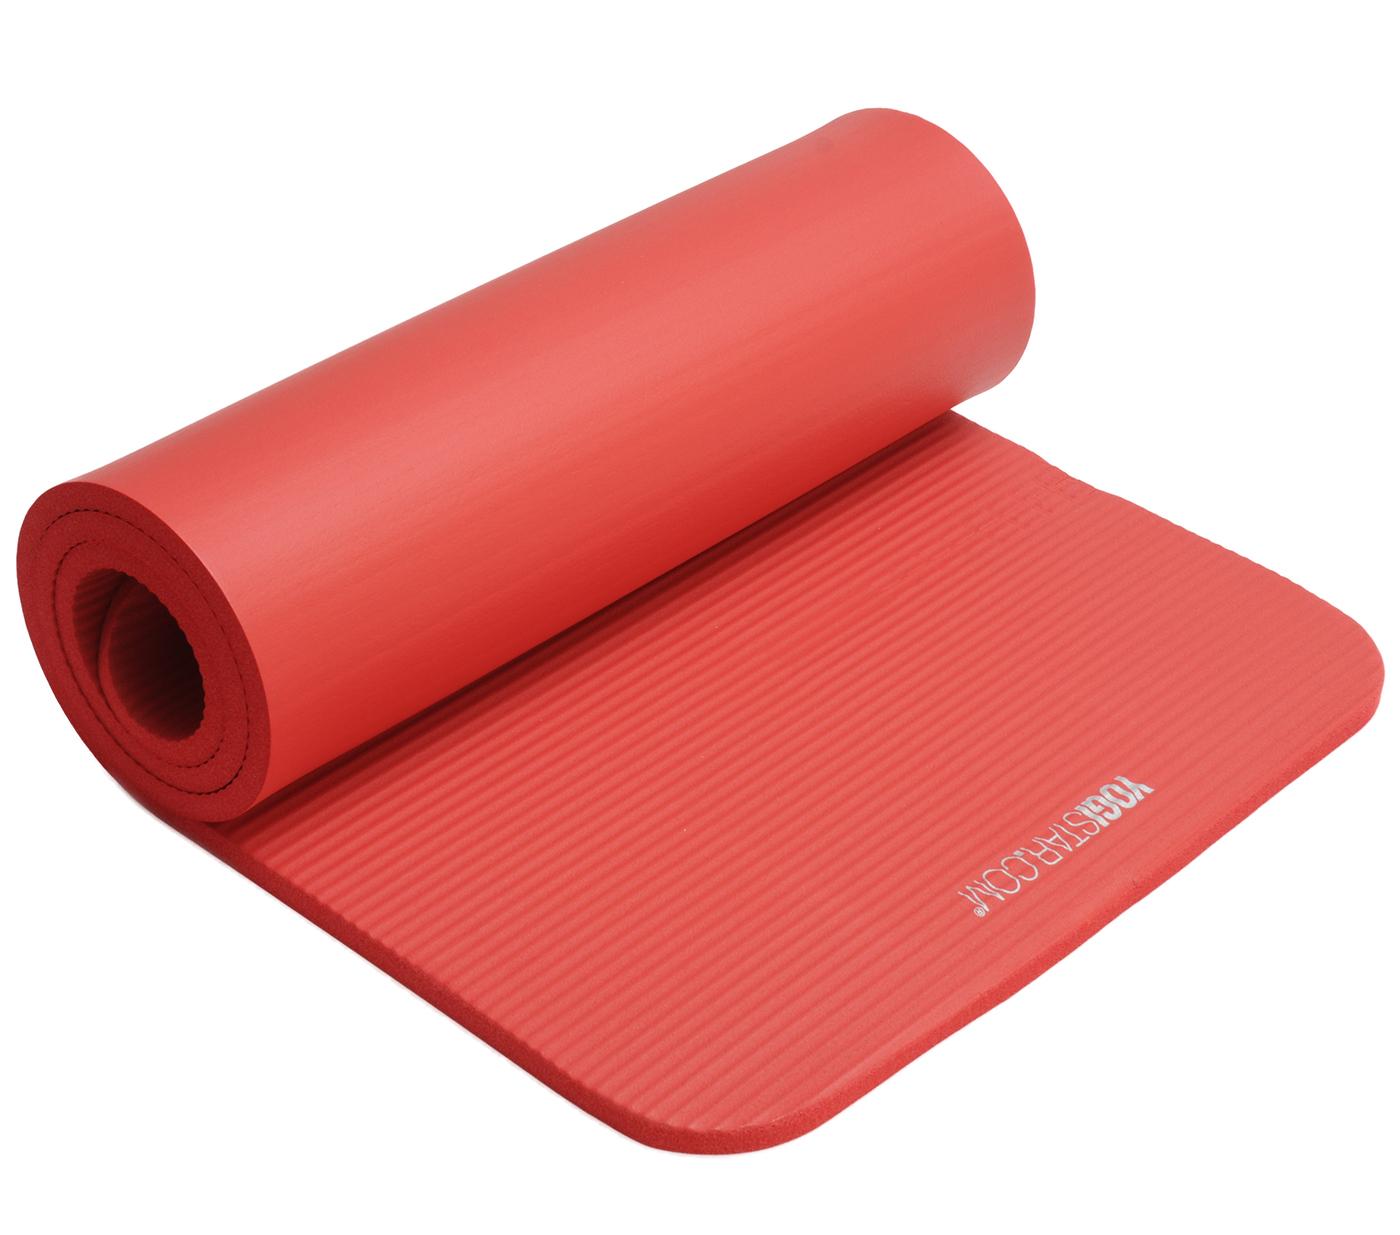 2 wahl fitnessmatte gym 15 mm red im yogishop kaufen yoga2 wahl fitnessmatte gym 15 mm red